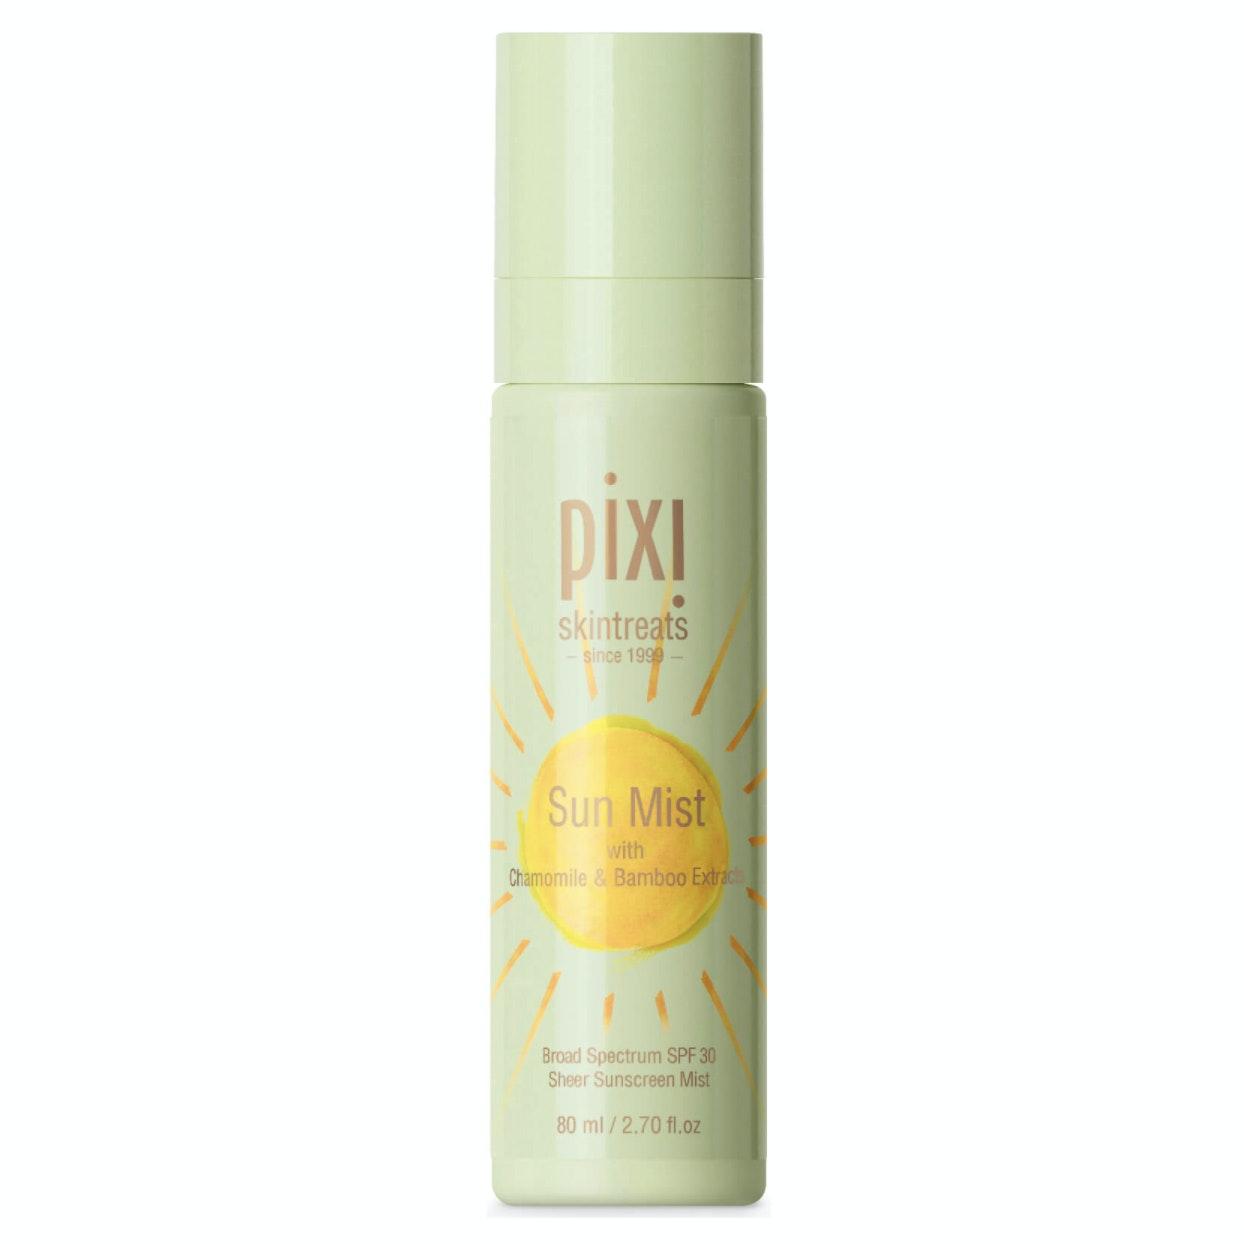 Pixi® Sun Mist Broad Spectrum Protection SPF 30